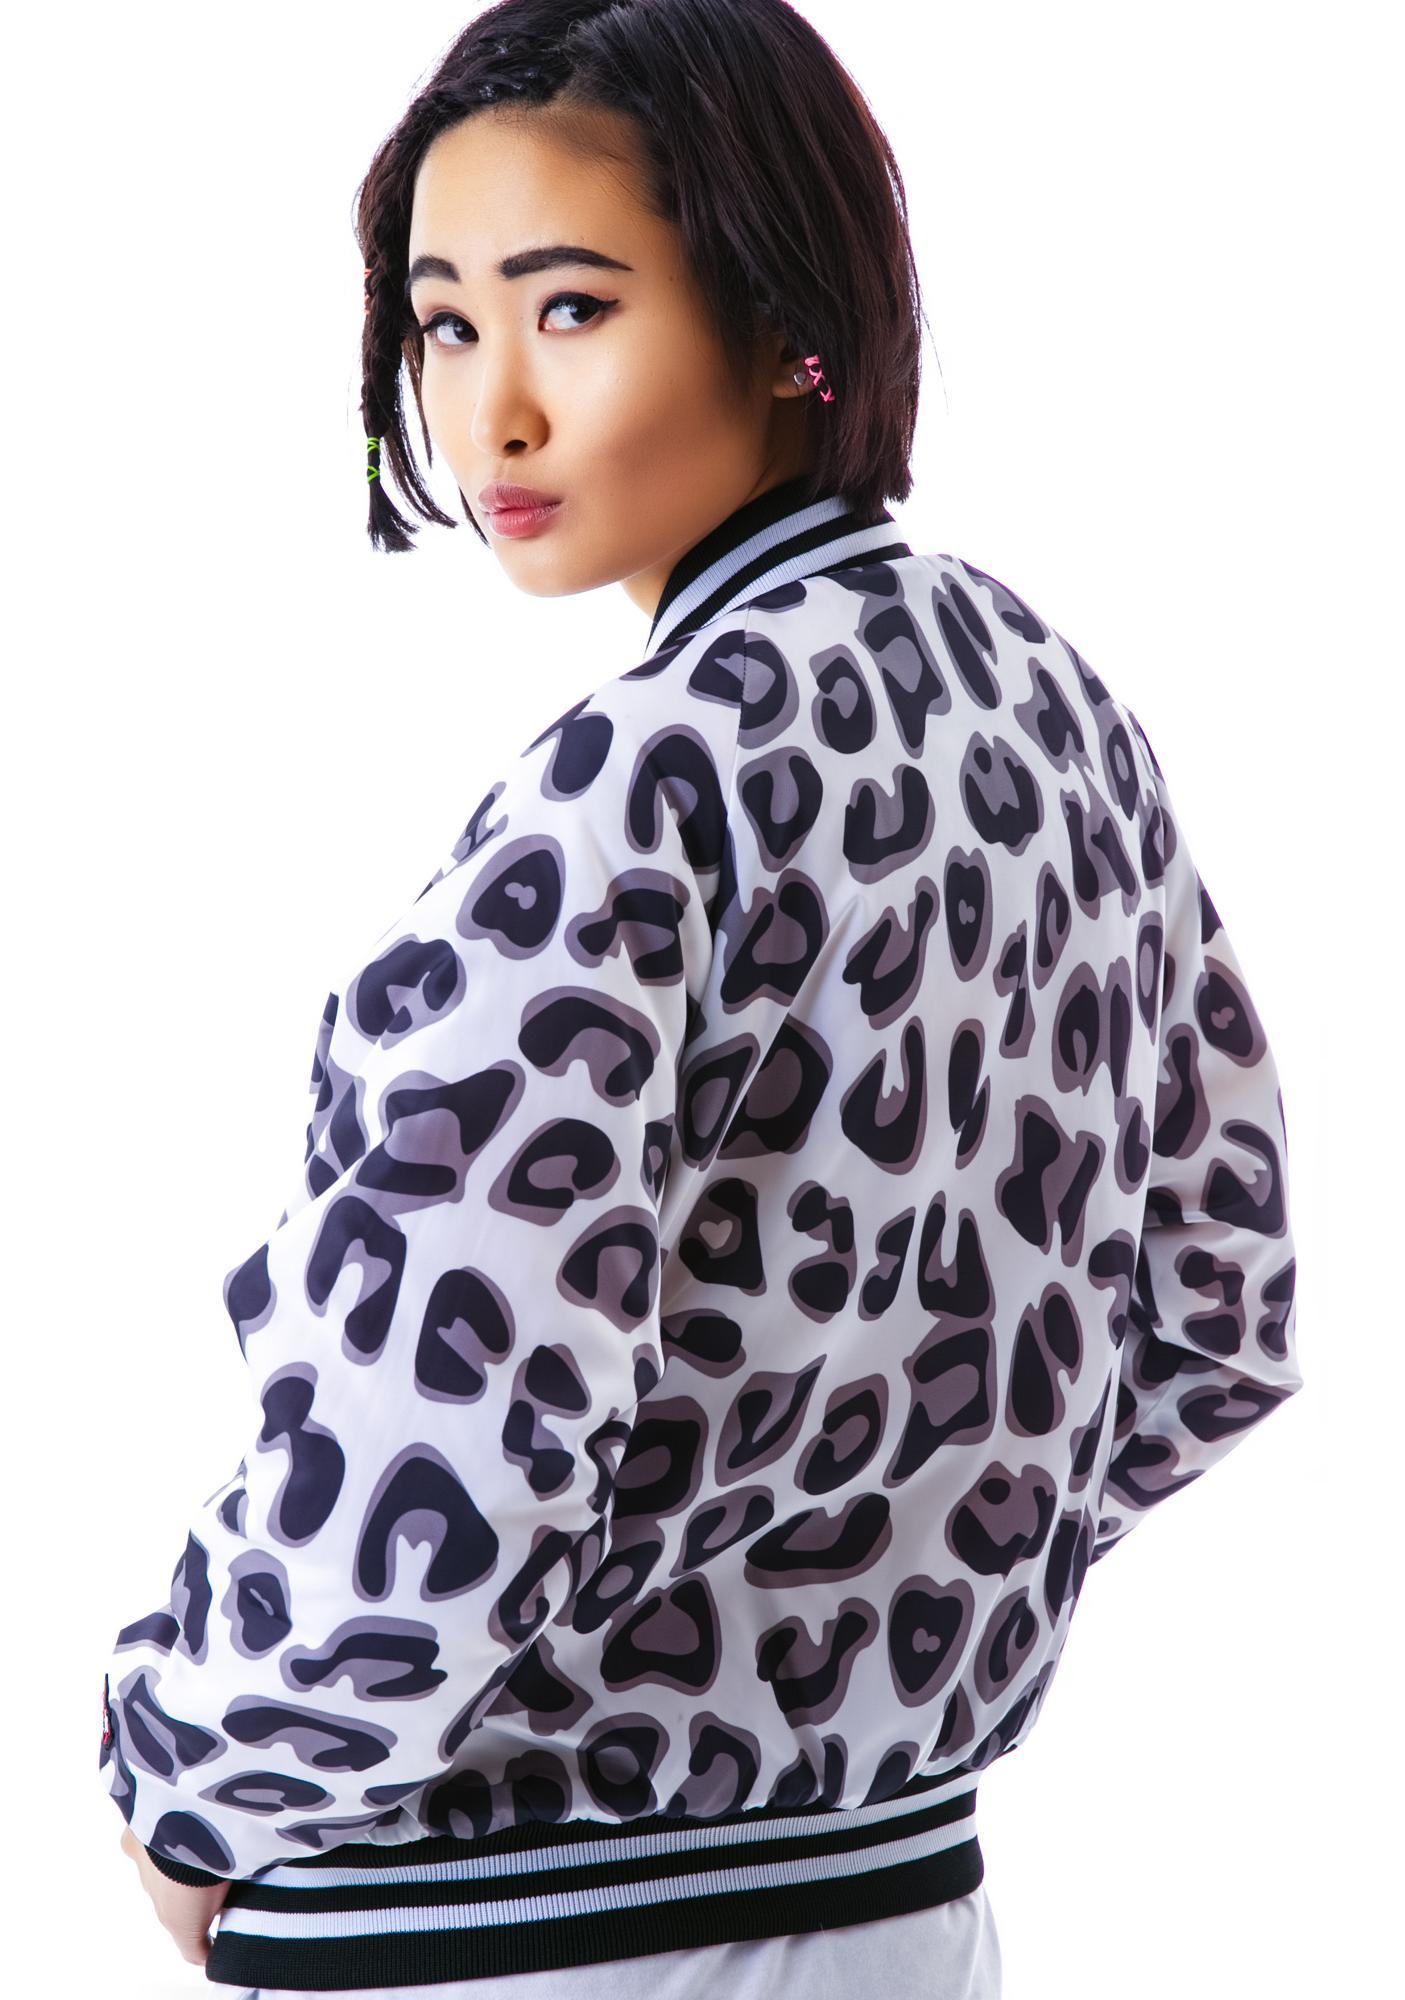 Joyrich Candy Leopard Athletic Jacket